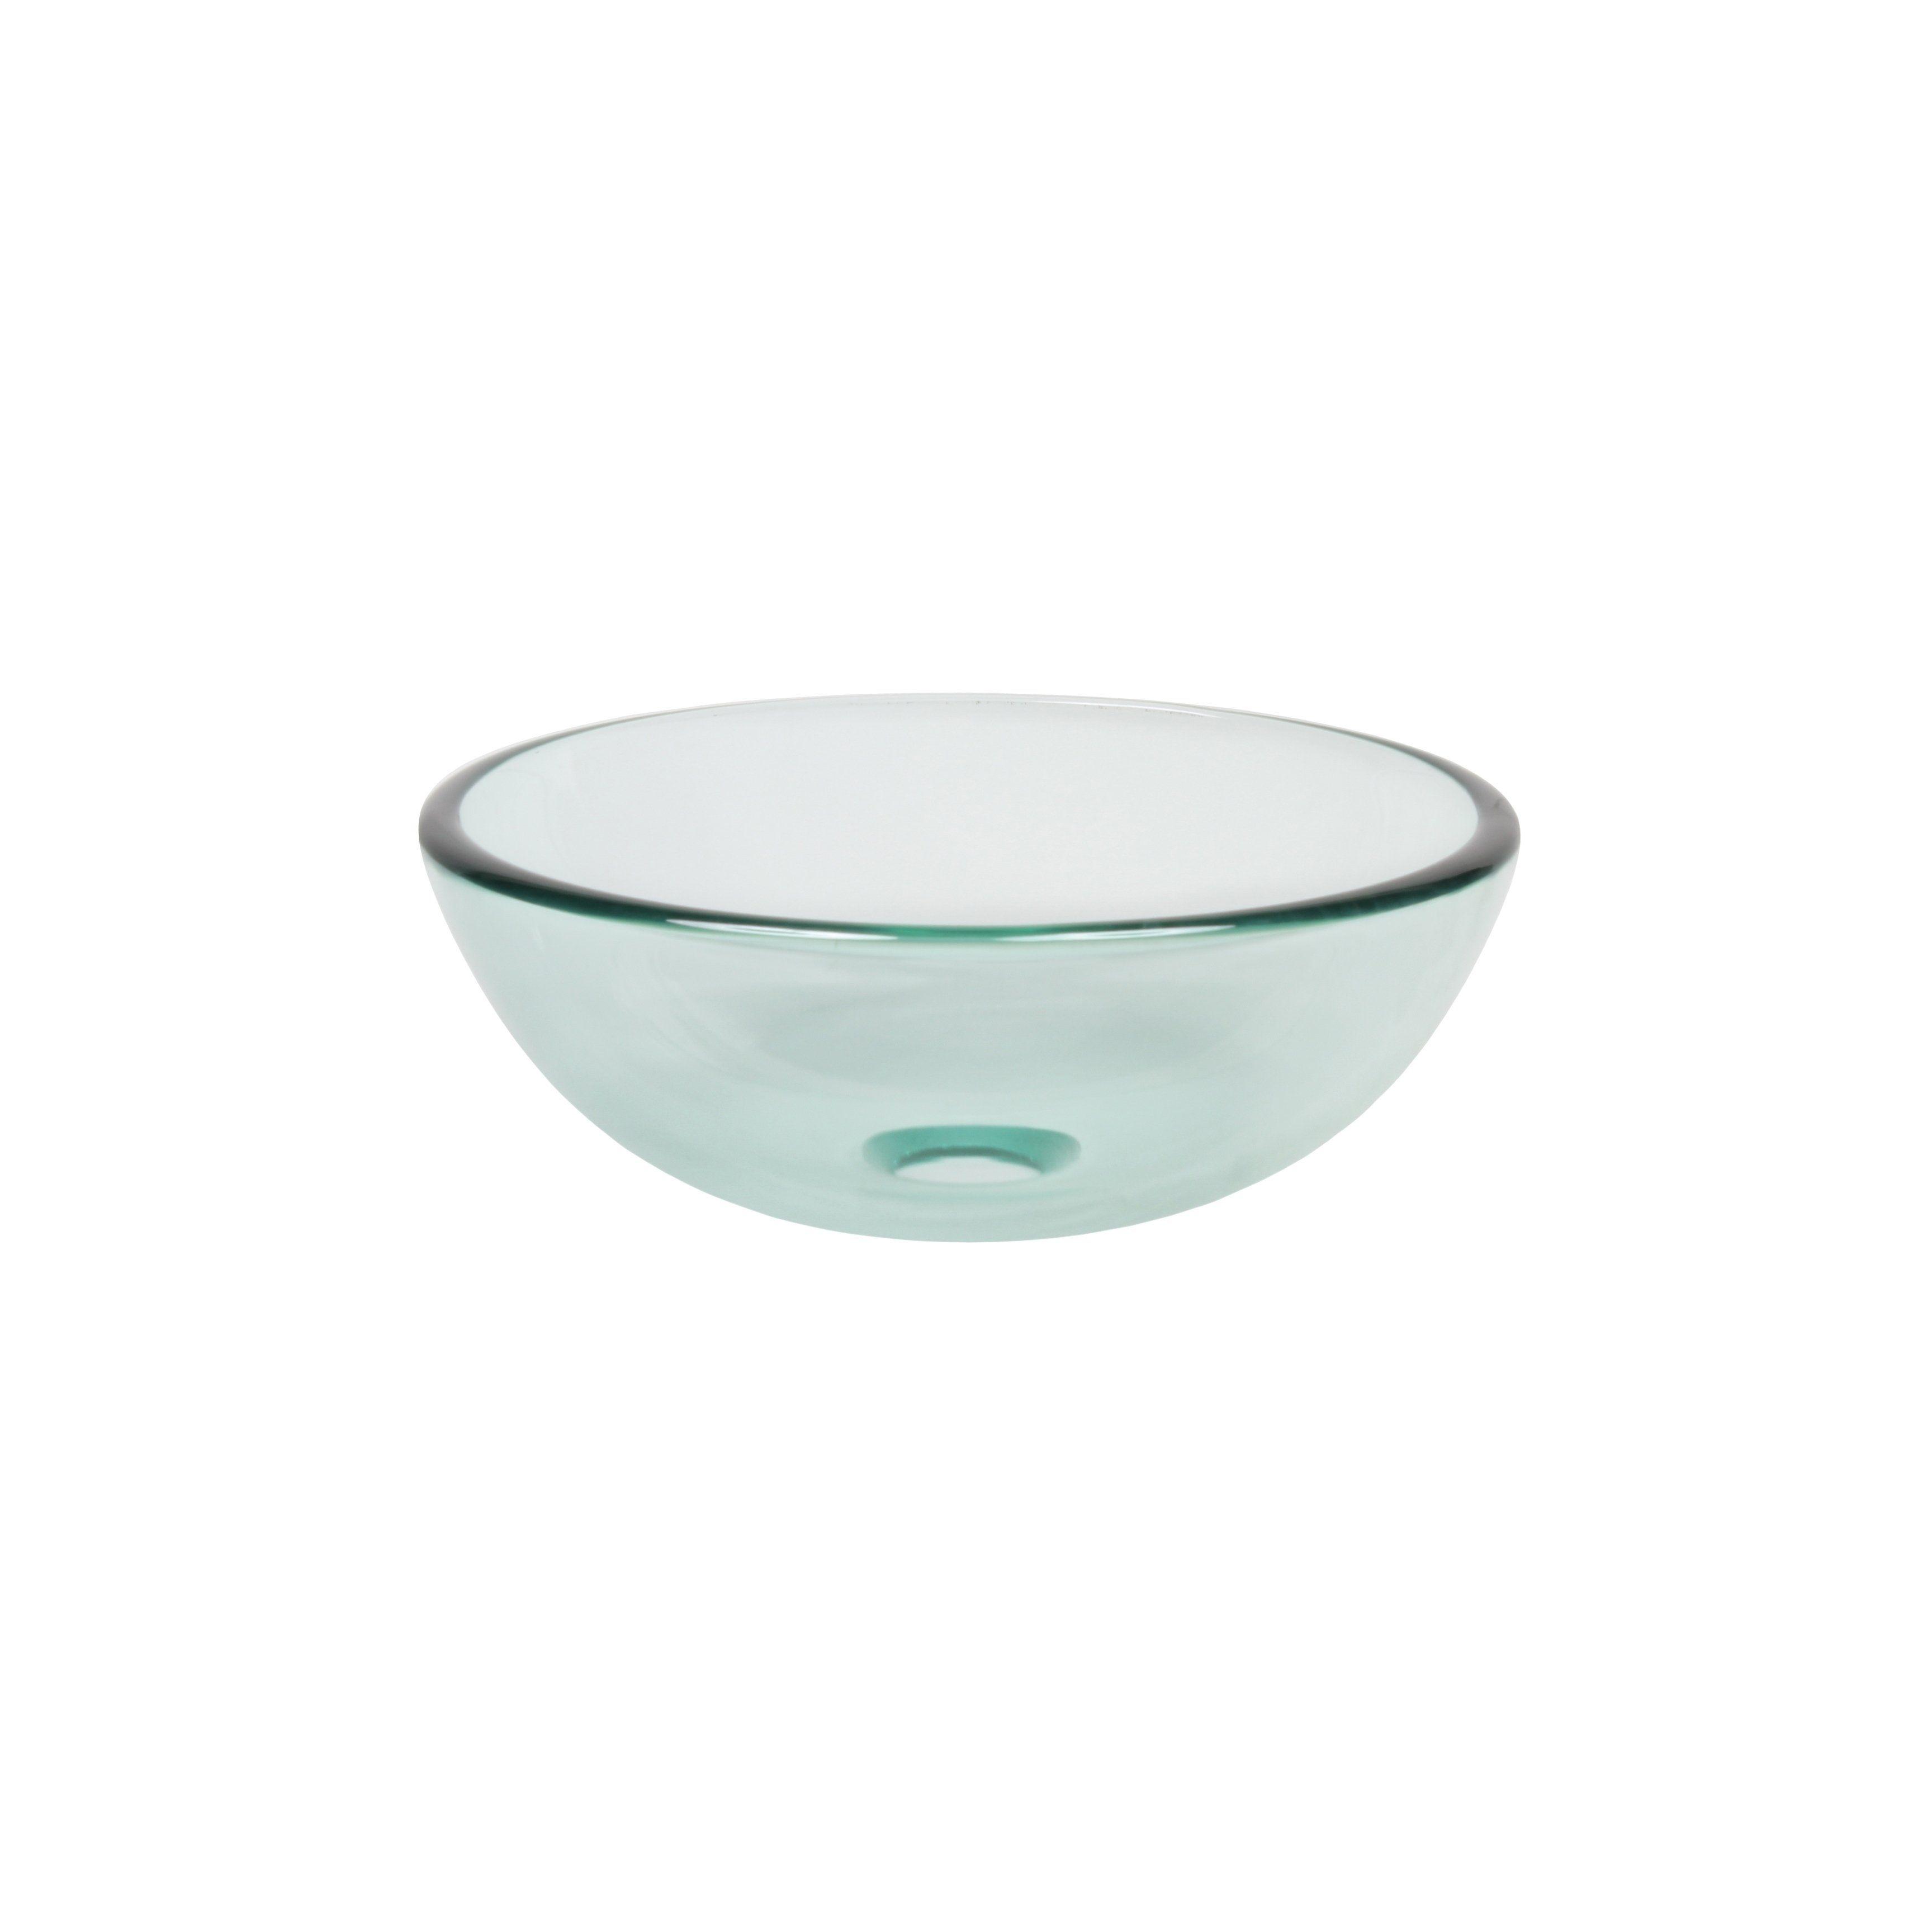 Novatto Clear Mini 12 Inch Glass Vessel Bathroom Sink Bronze Glass Sink Glass Vessel Sinks Wall Mounted Bathroom Sinks